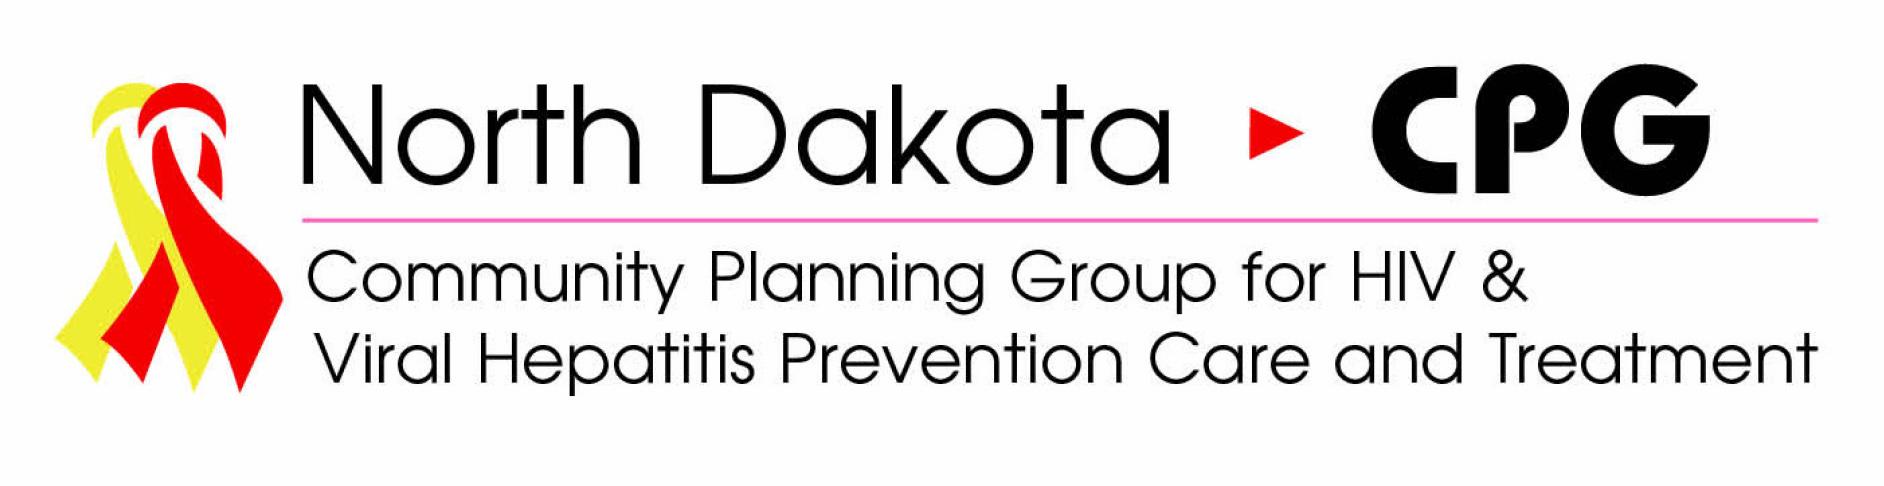 North Dakota Community Planning Group for HIV Prevention